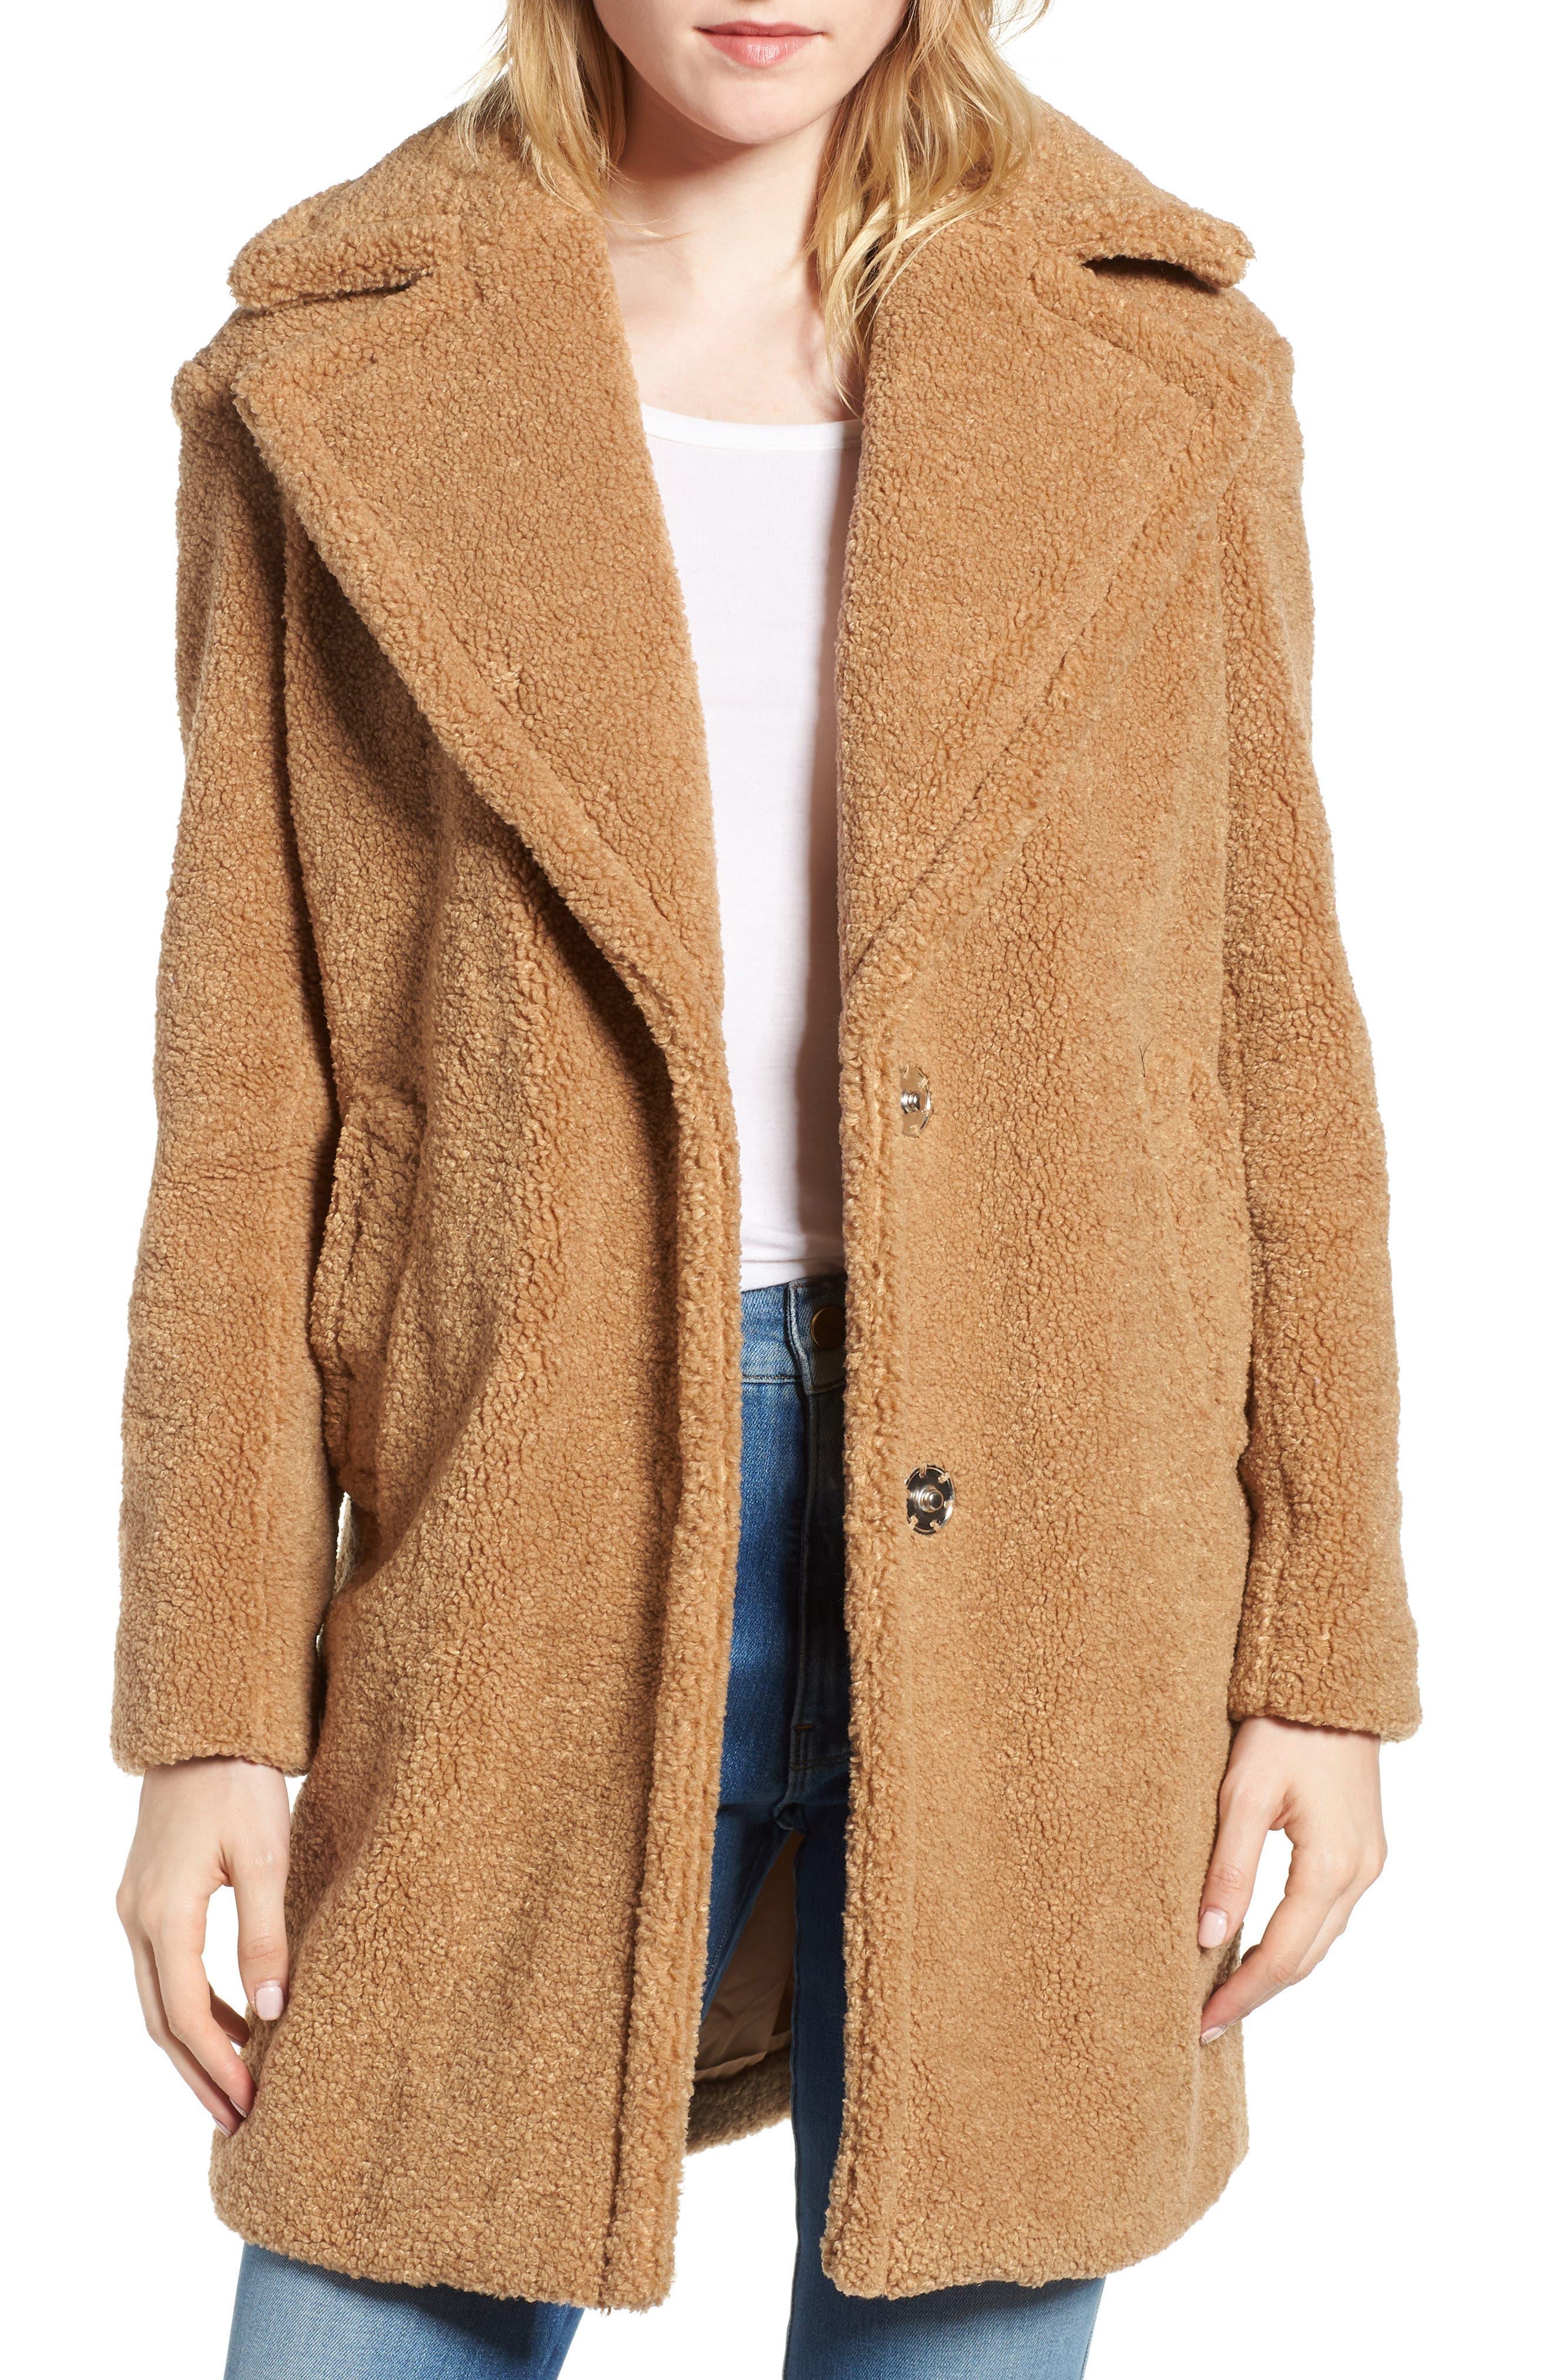 Women's 70s Shirts, Blouses, Hippie Tops Womens Kensie Faux Fur Teddy Bear Coat Size Medium - Beige $89.90 AT vintagedancer.com